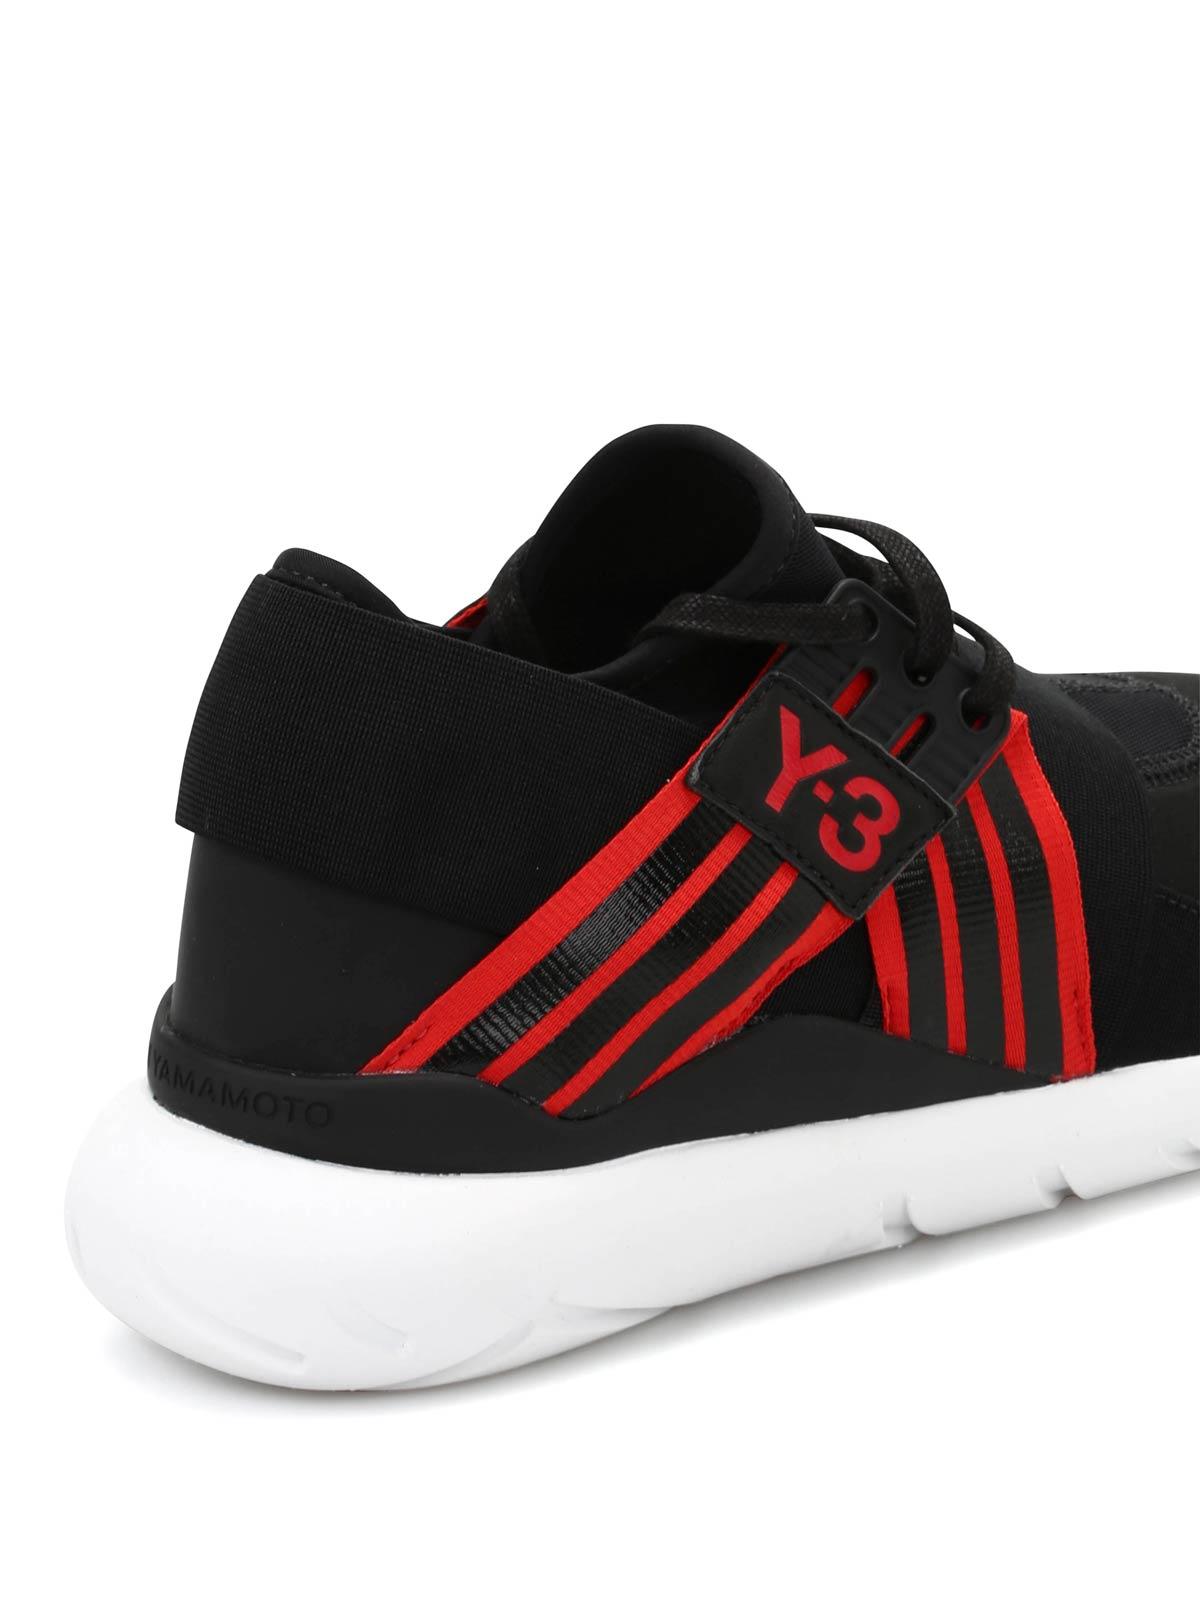 ca25cfb7bd842 Adidas Y-3 - Y-3 Qasa Elle Lace sneakers - trainers ...